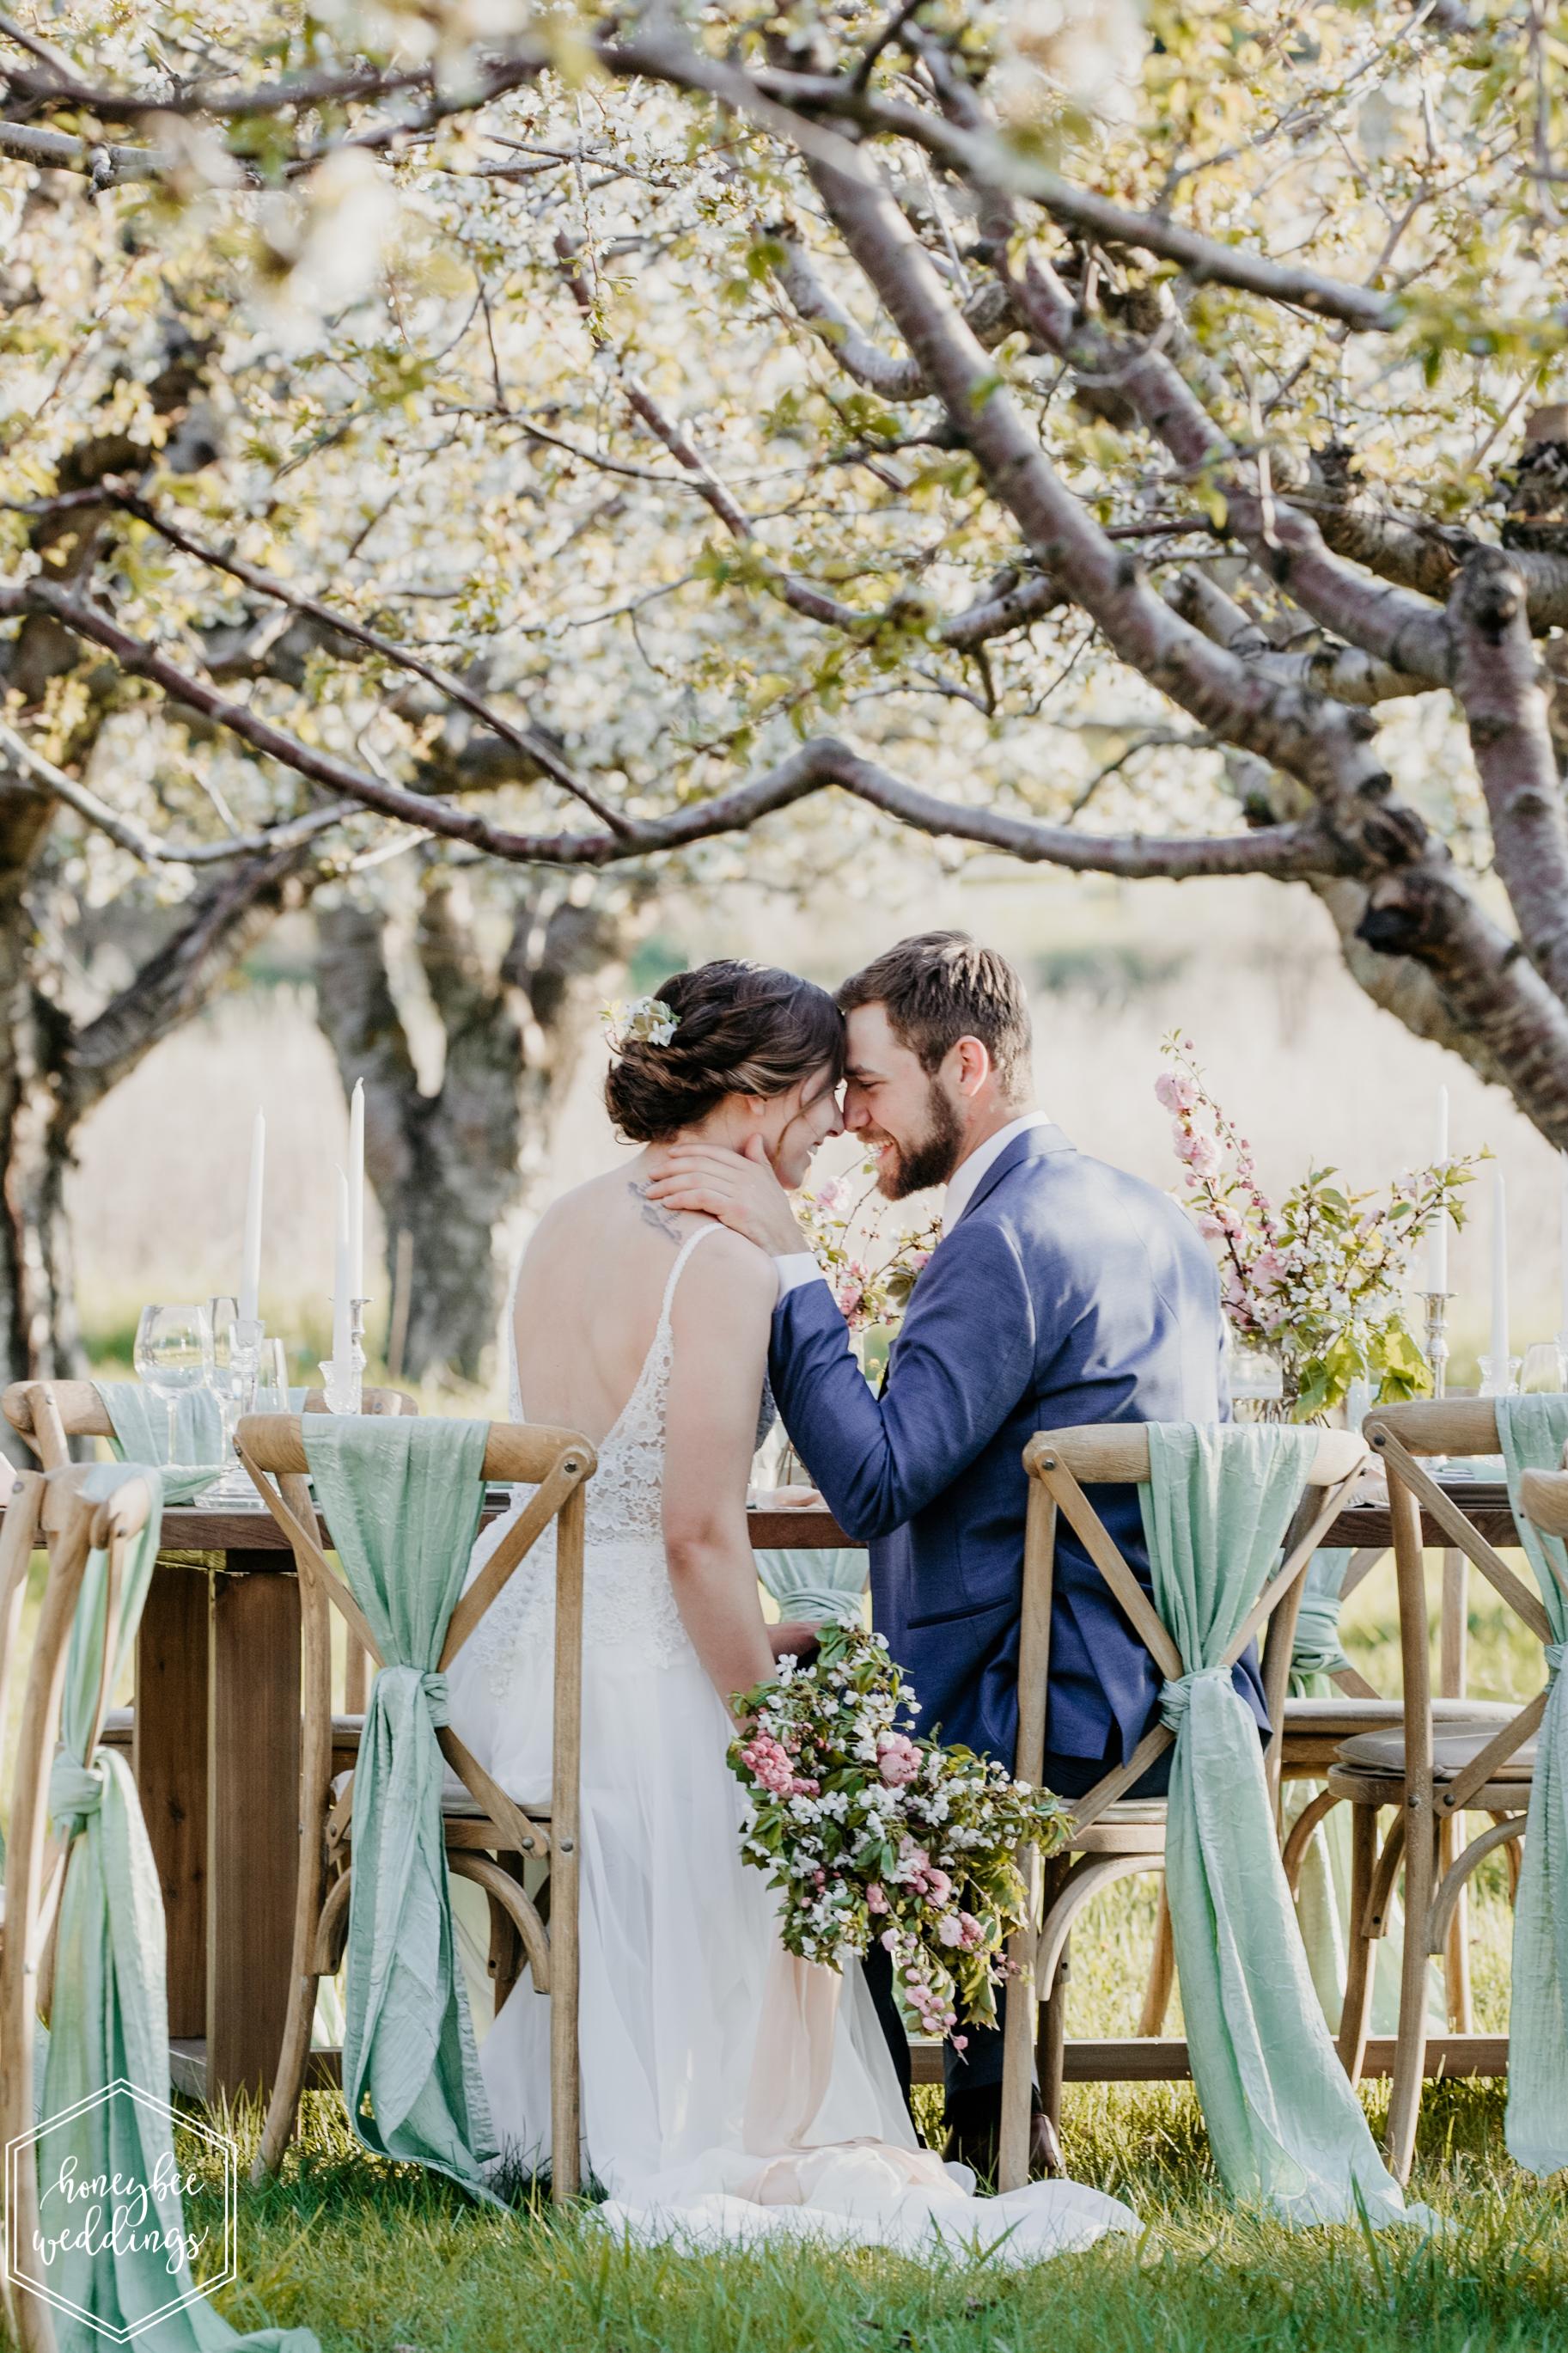 148Cherry Blossom Wedding_Styled Photoshoot_Honeybee Weddings_May 11, 2019-656.jpg